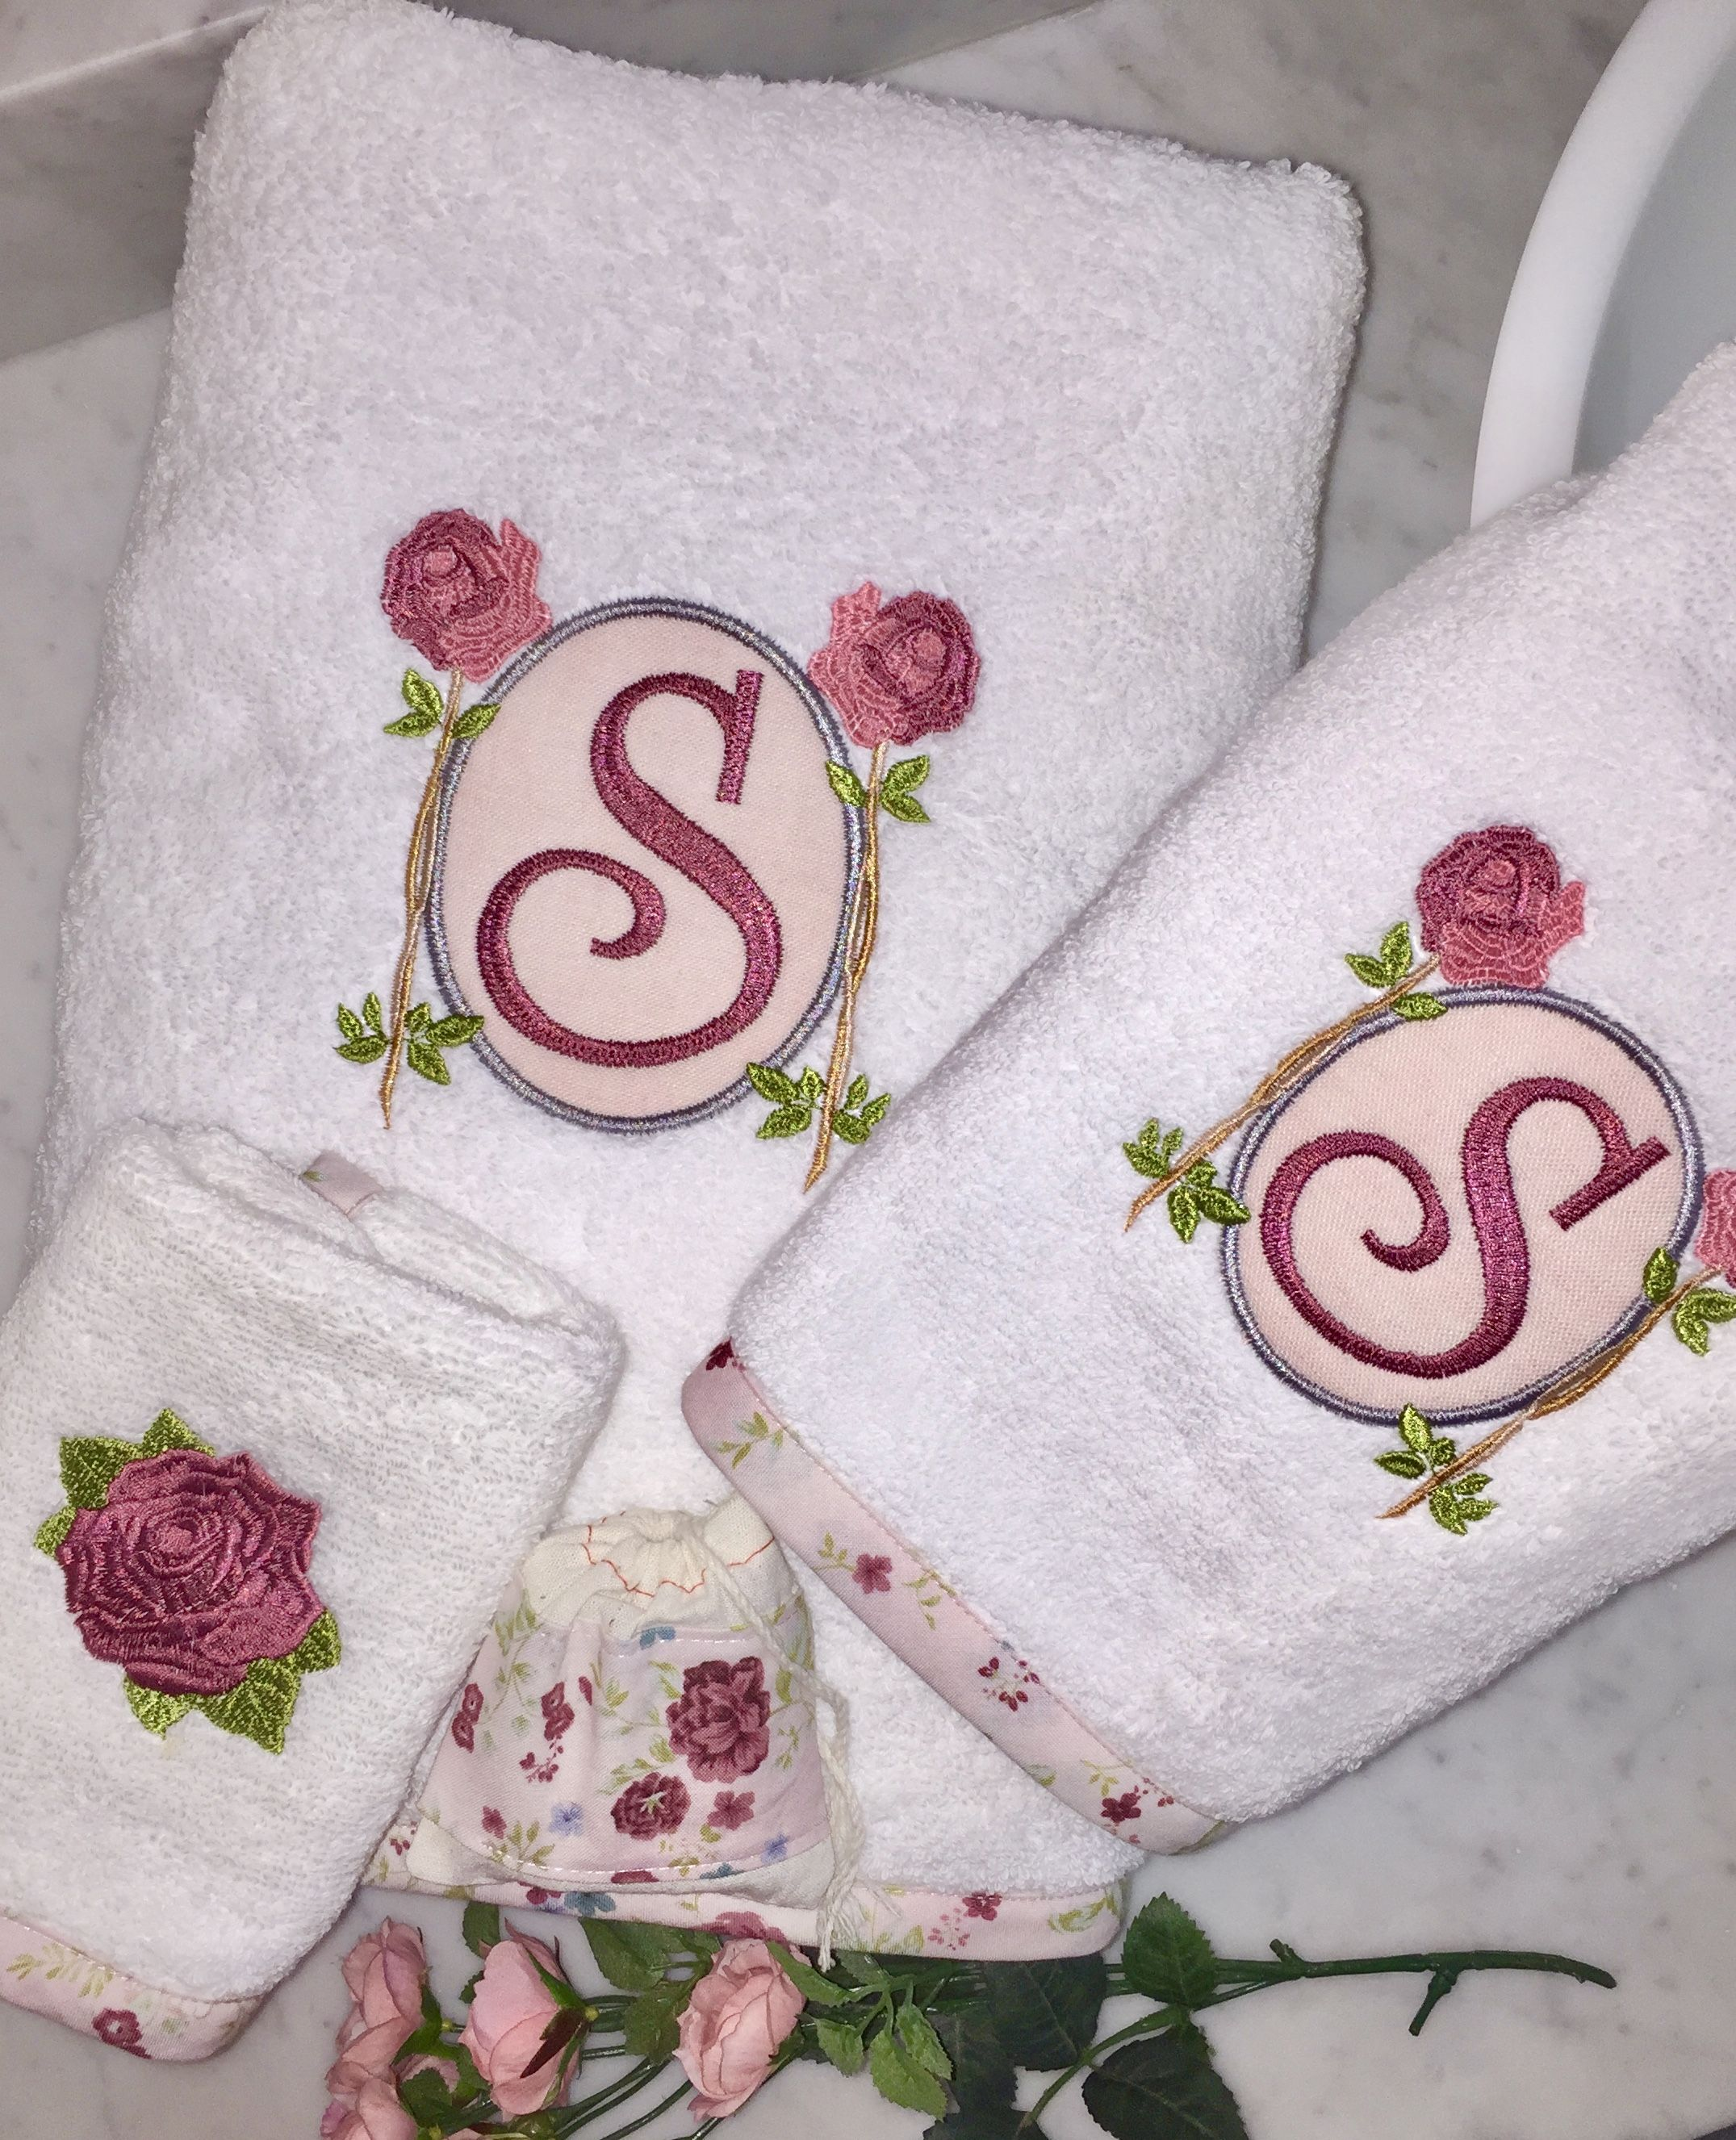 Bias Trimming Bath Towel Sets Embroidered Bath Towels